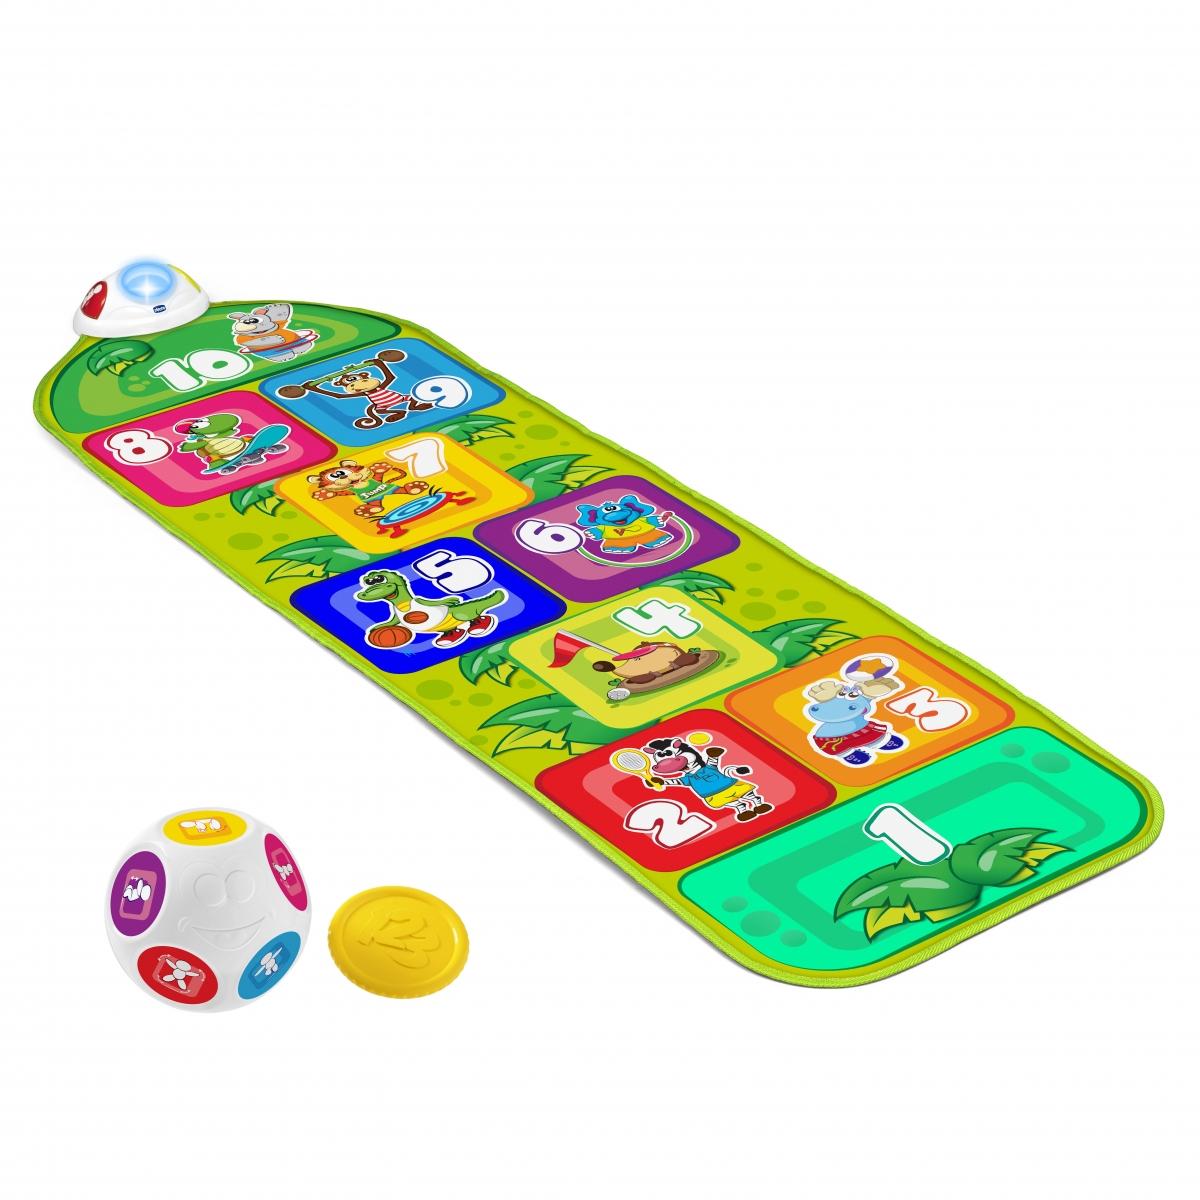 Chicco Jump & Fit Hopscotch Playmat